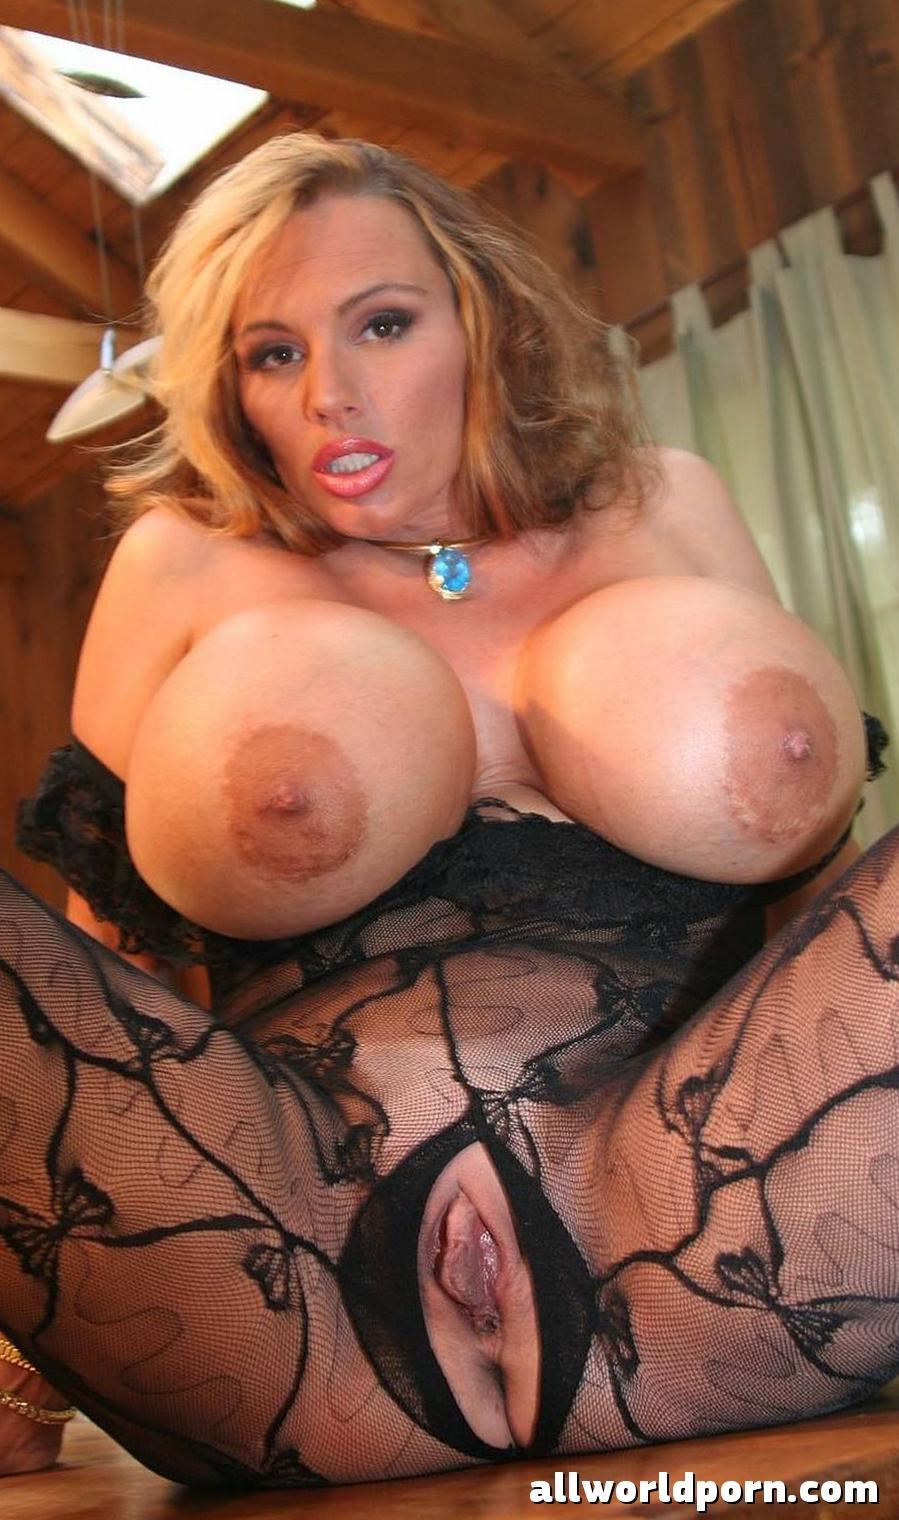 Mature boobs nude Old Women